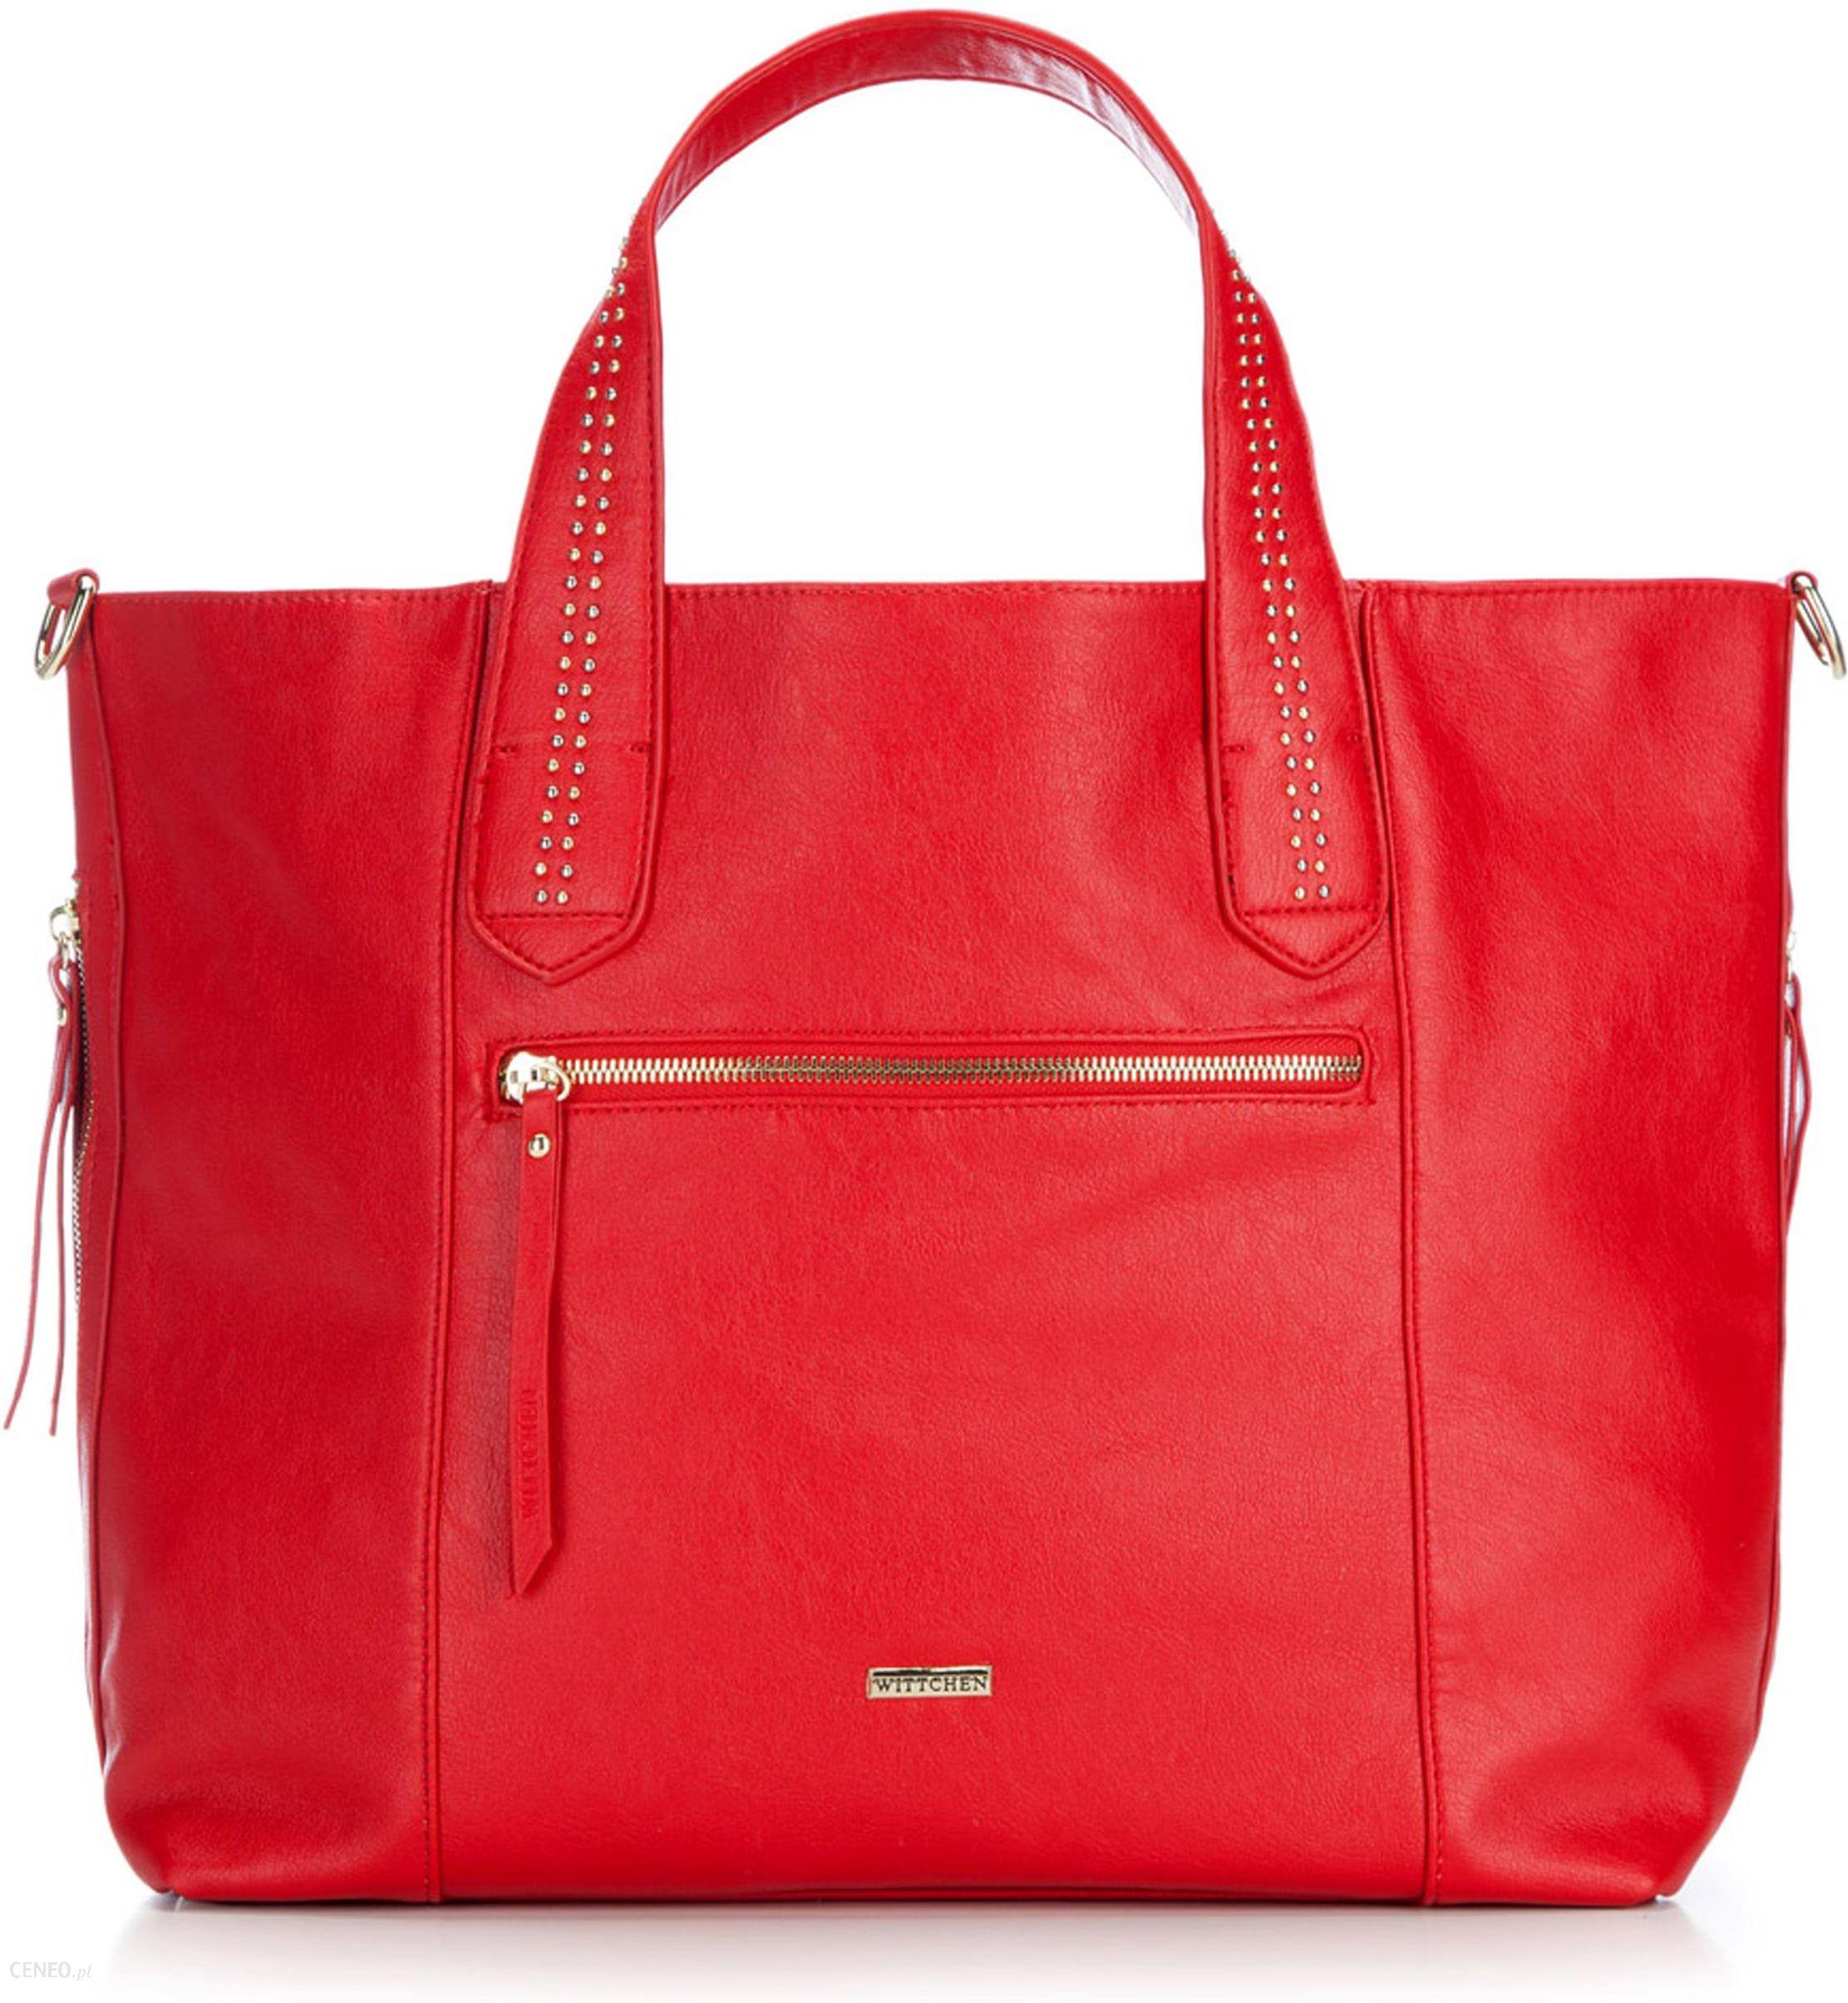 27d97a6118005 Torebka Wittchen Young Shopper Bag 86-4Y-120-3 czerwona - Ceny i ...